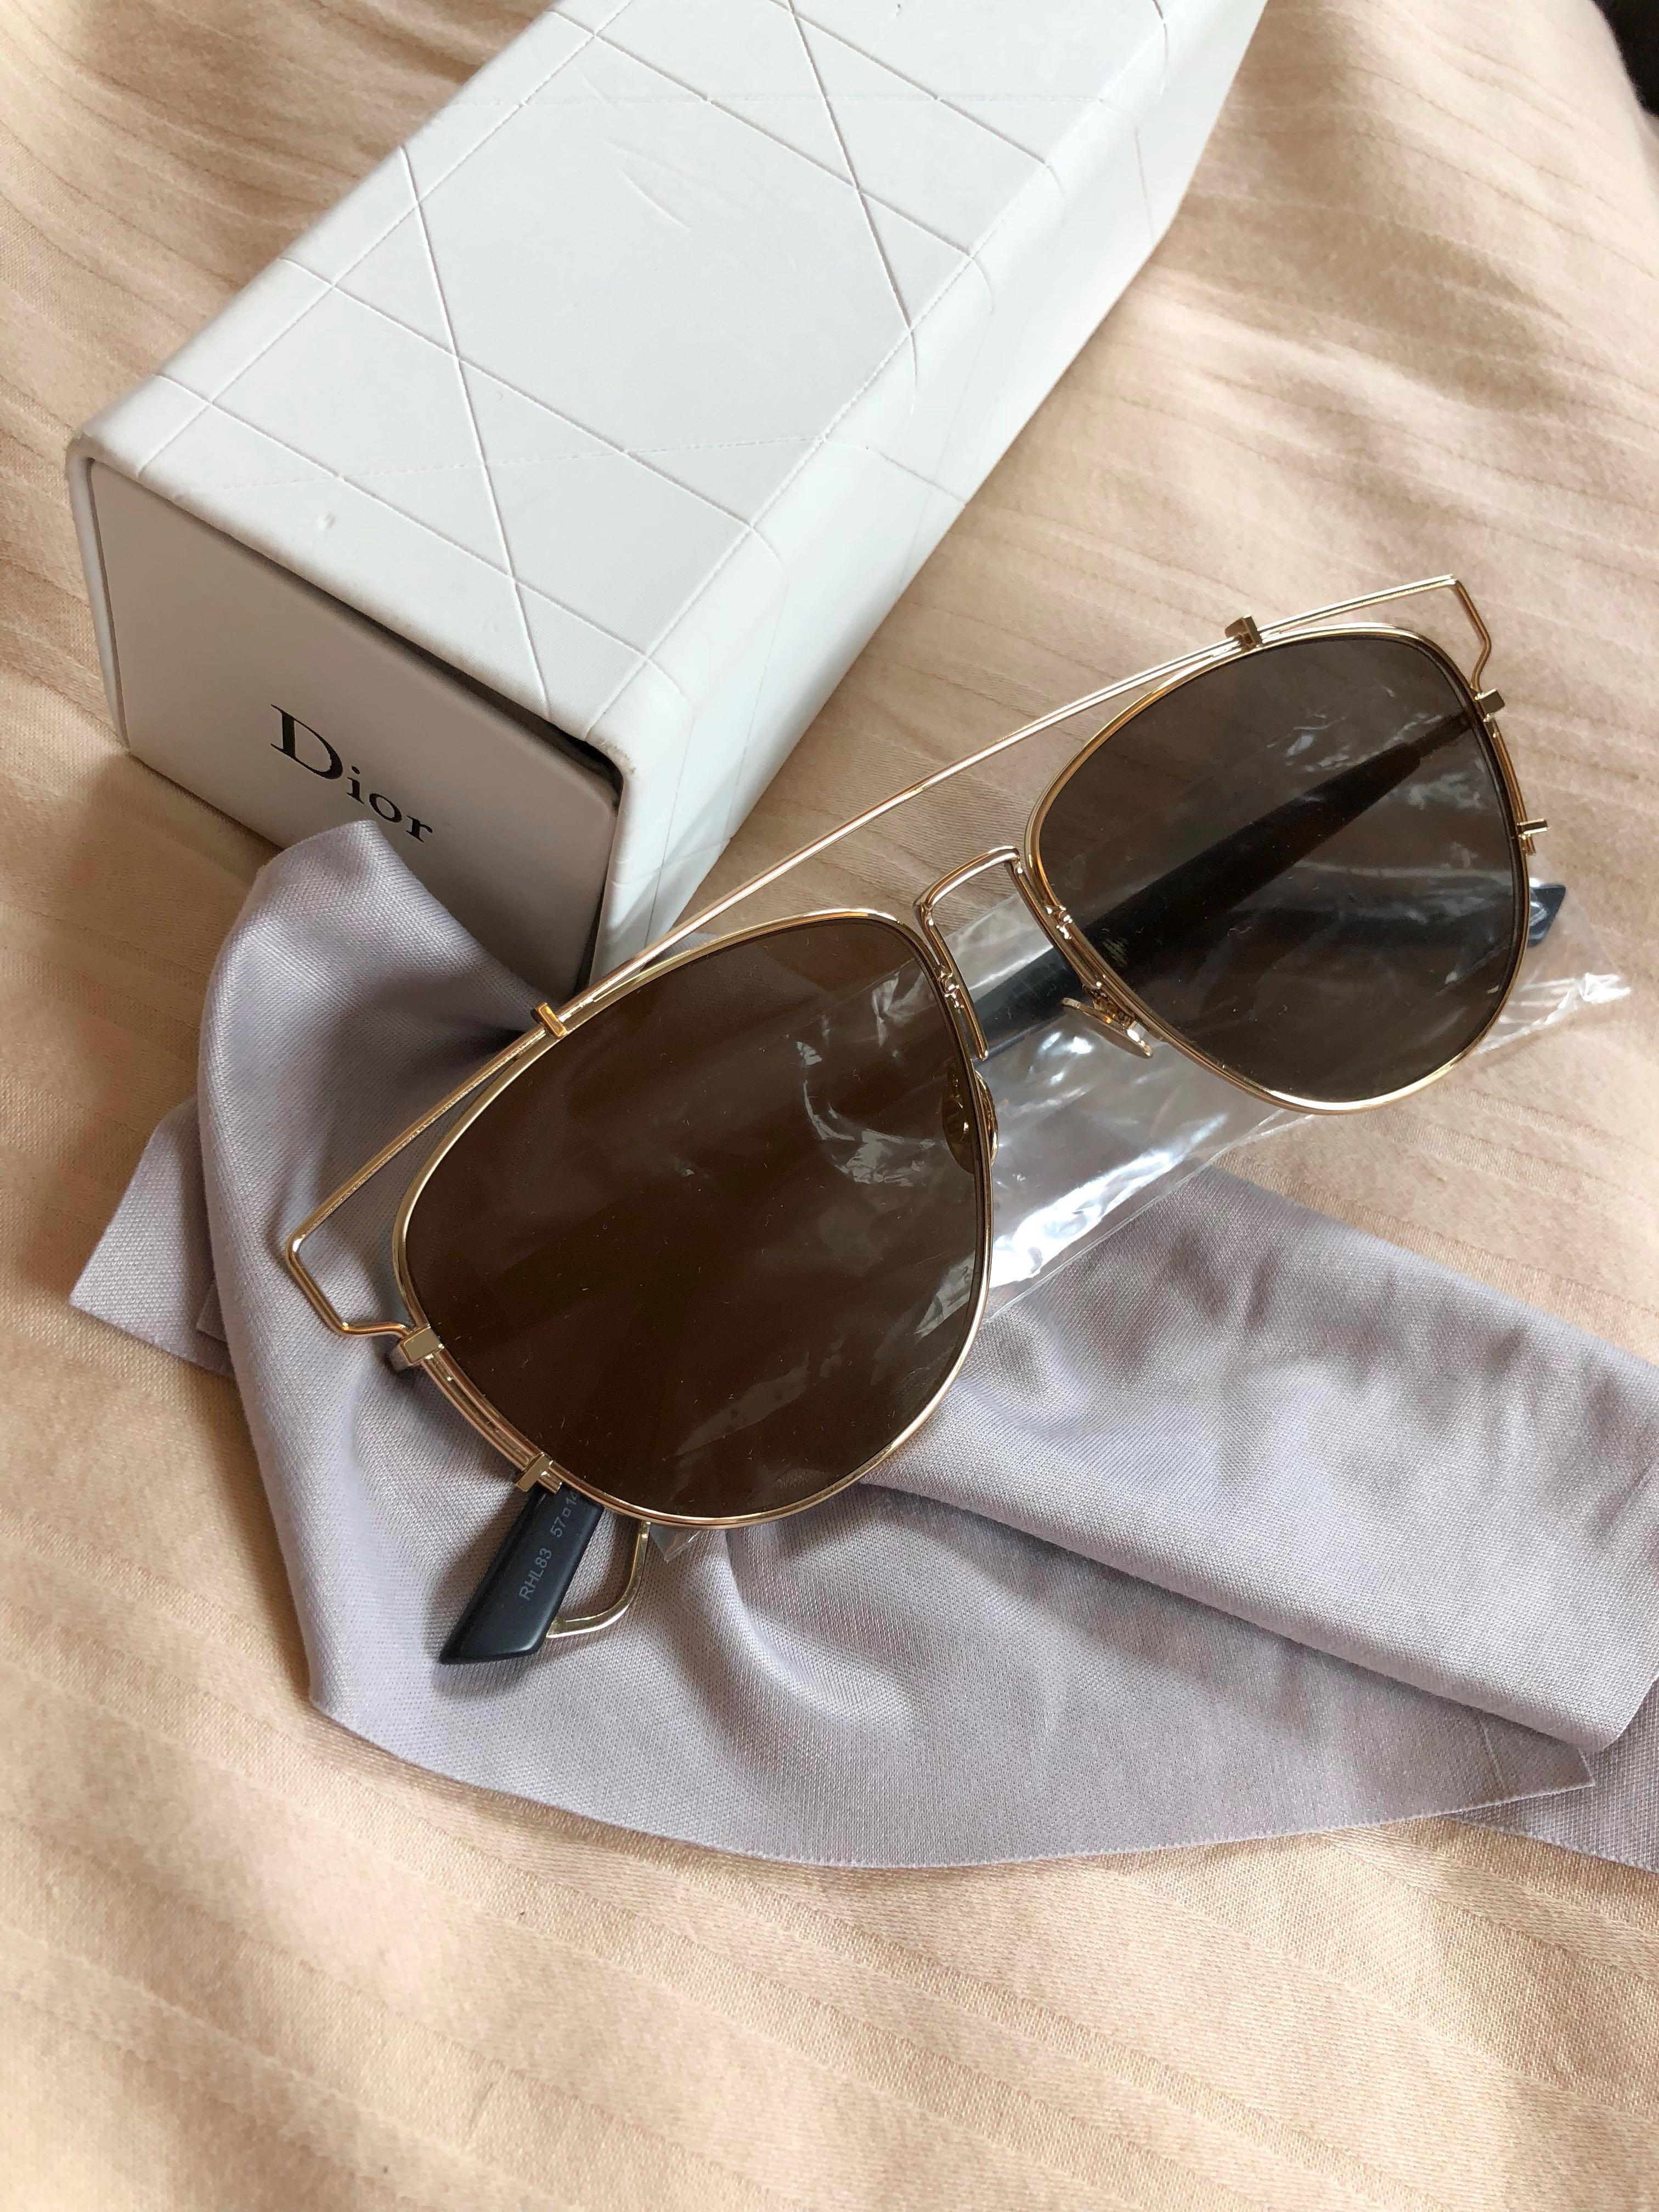 2ba380dd3b1 Home · Women s Fashion · Accessories · Eyewear   Sunglasses. photo photo ...